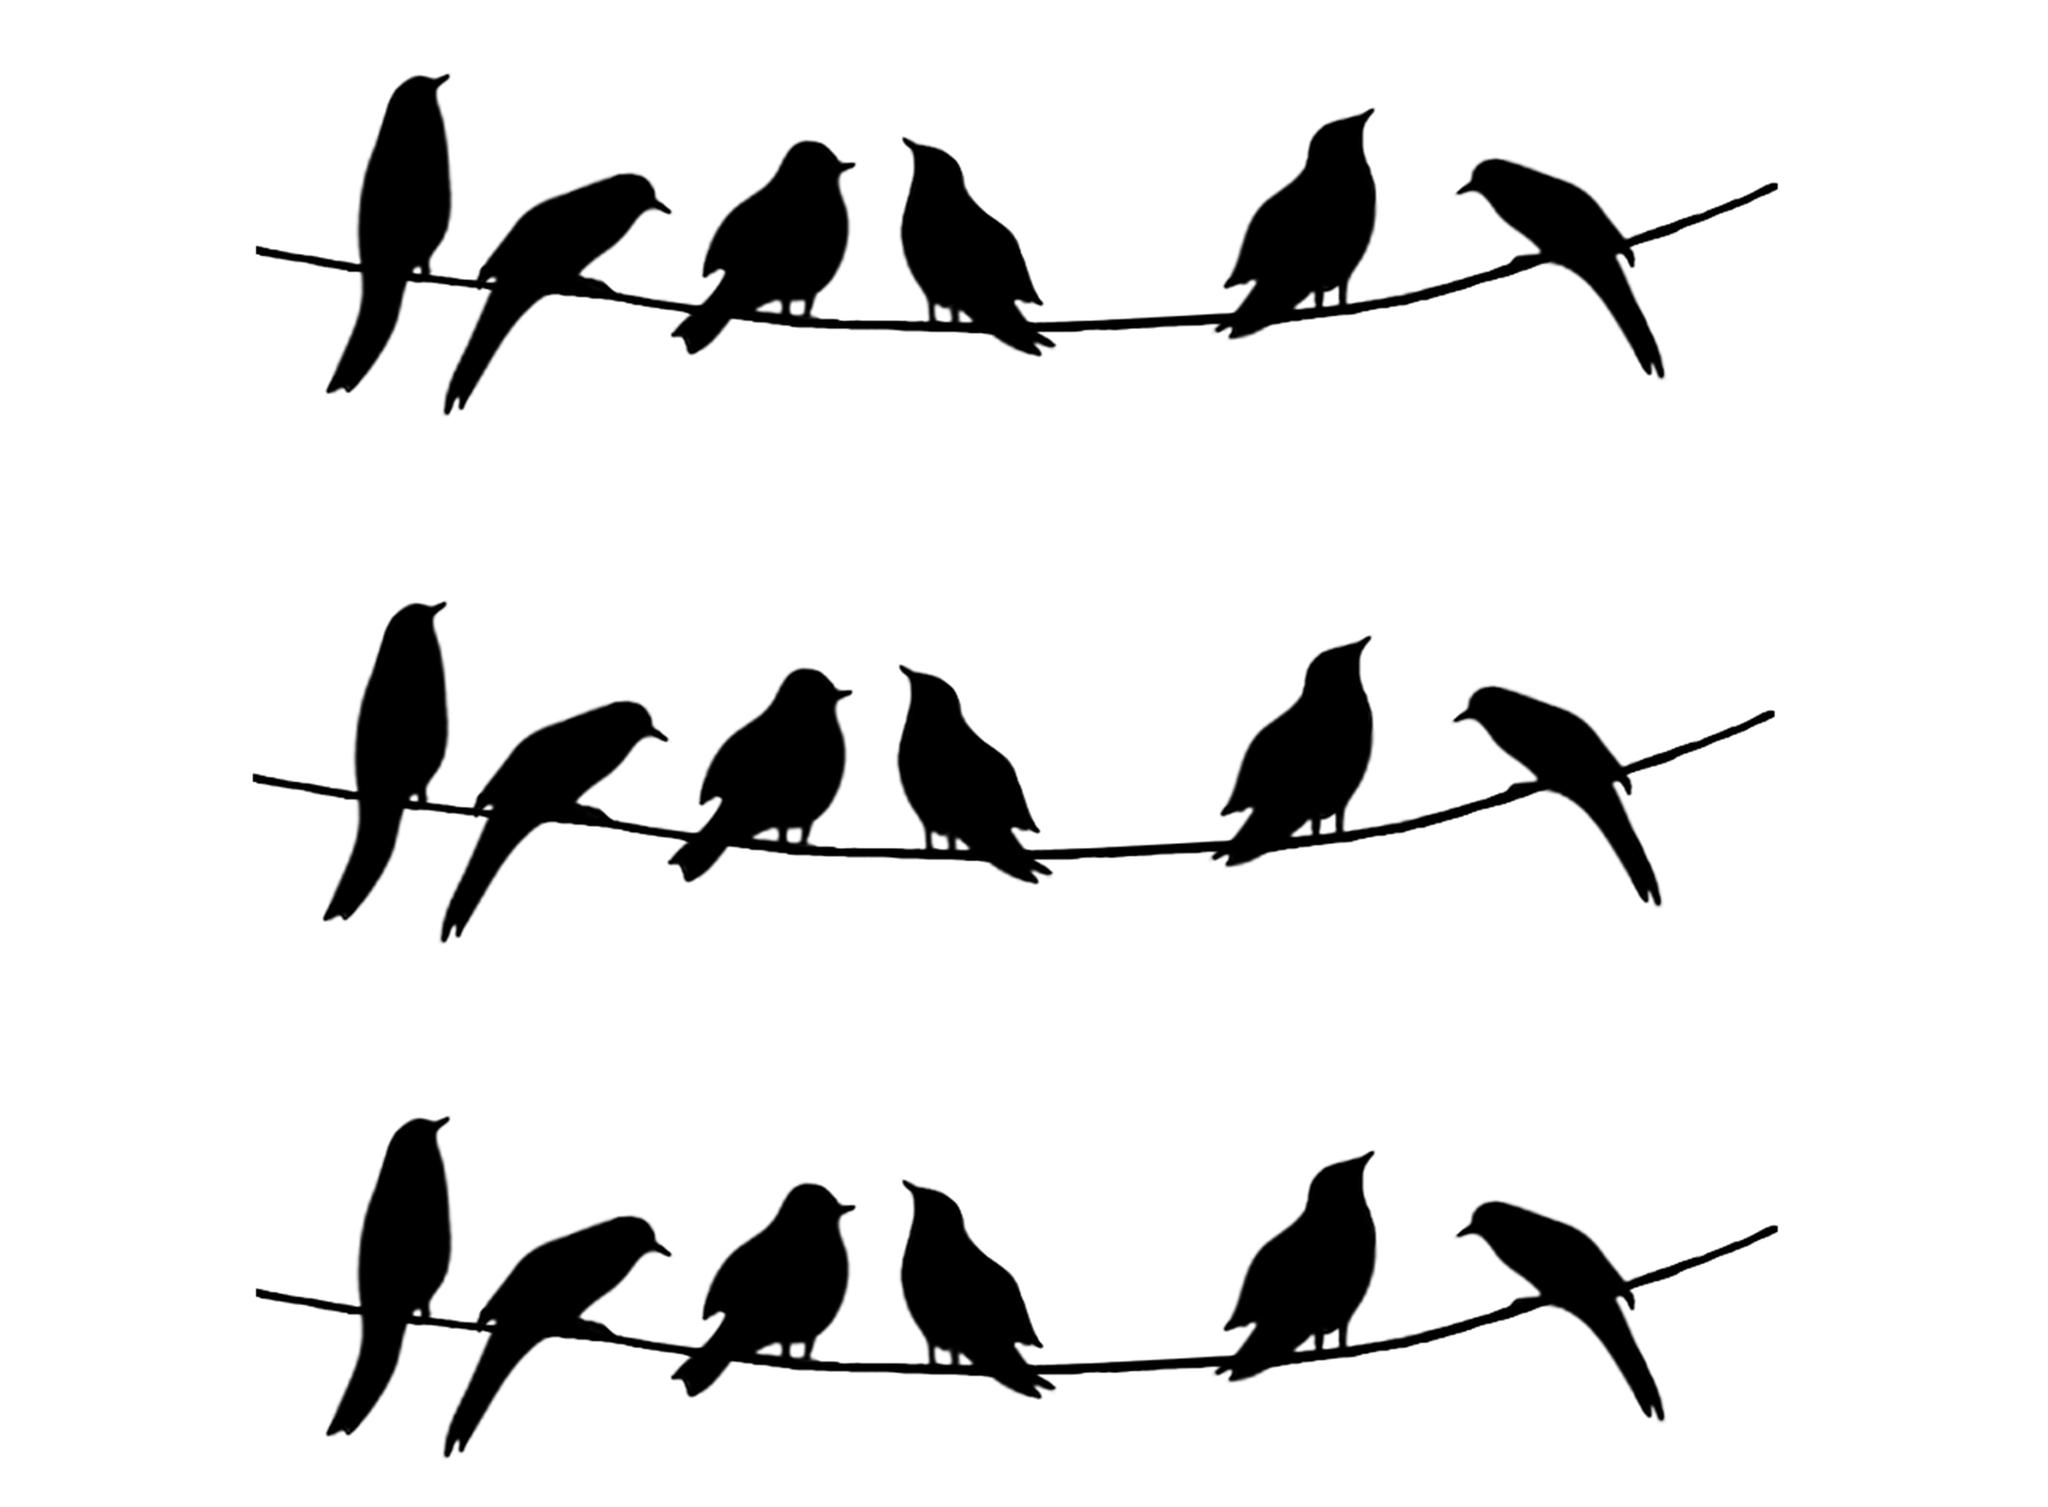 Barrette Birds on Wire Medium 3 pcs 3-1/4